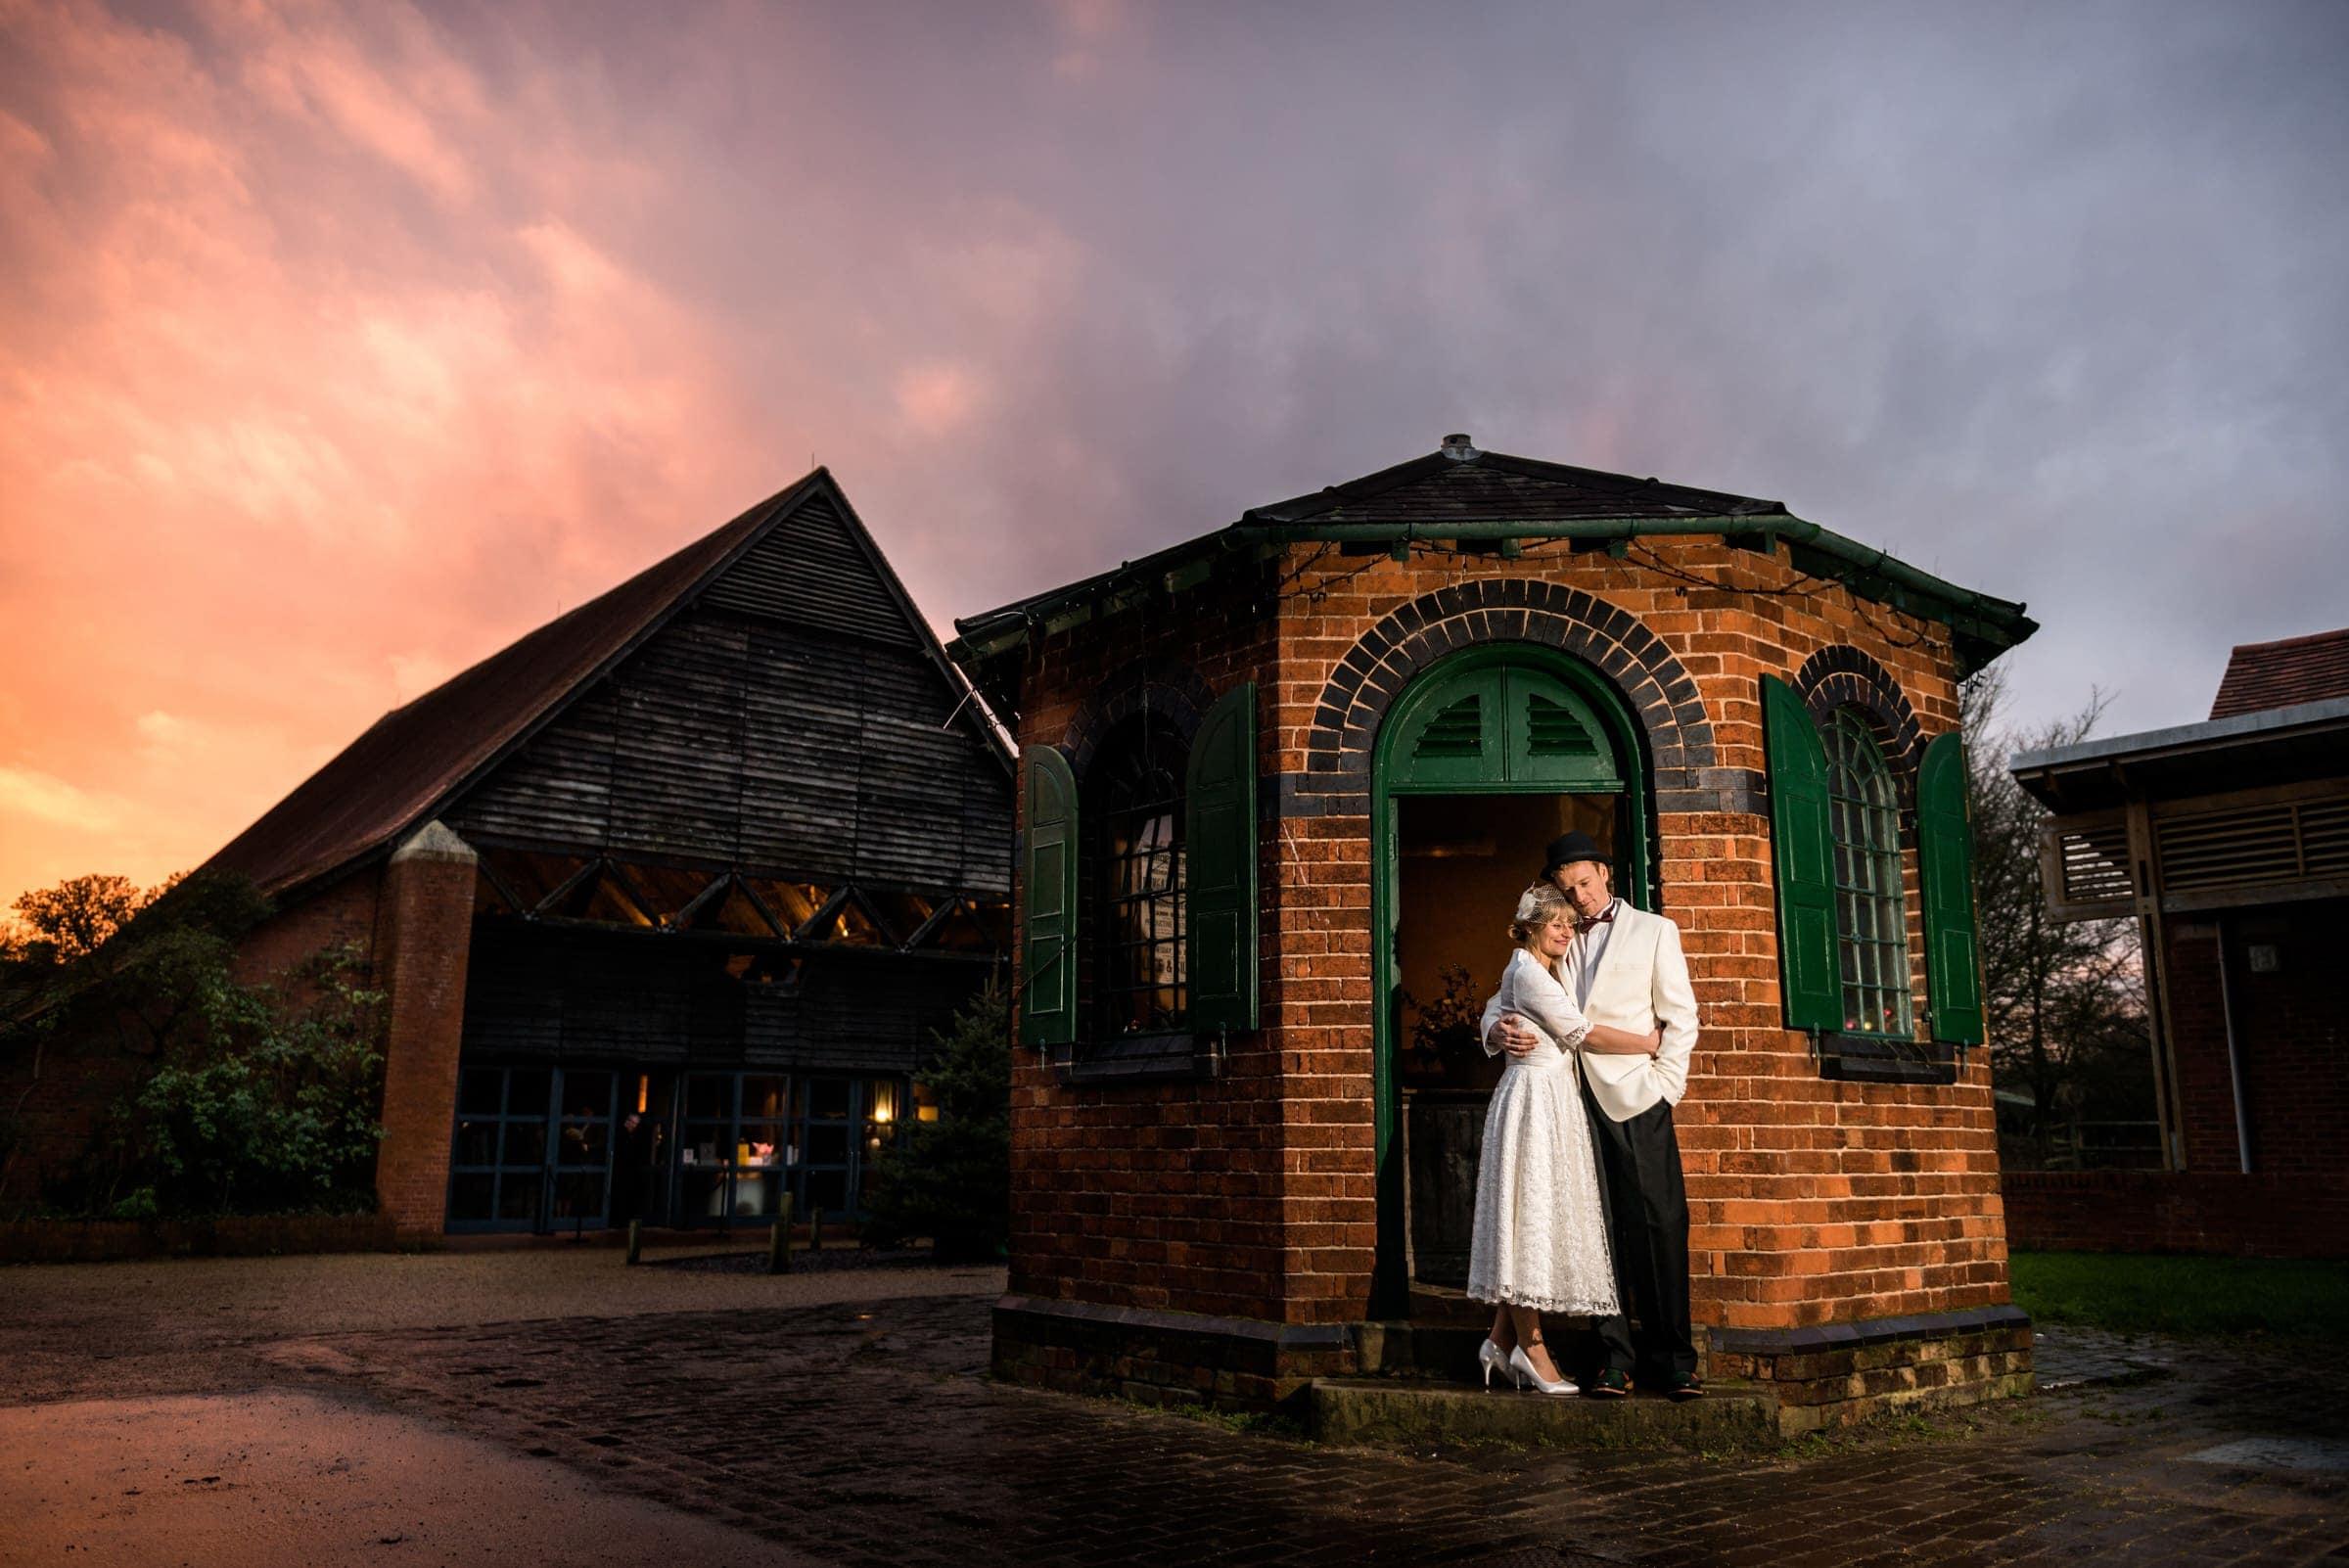 Bride & Groom Small Wedding at beautiful venue